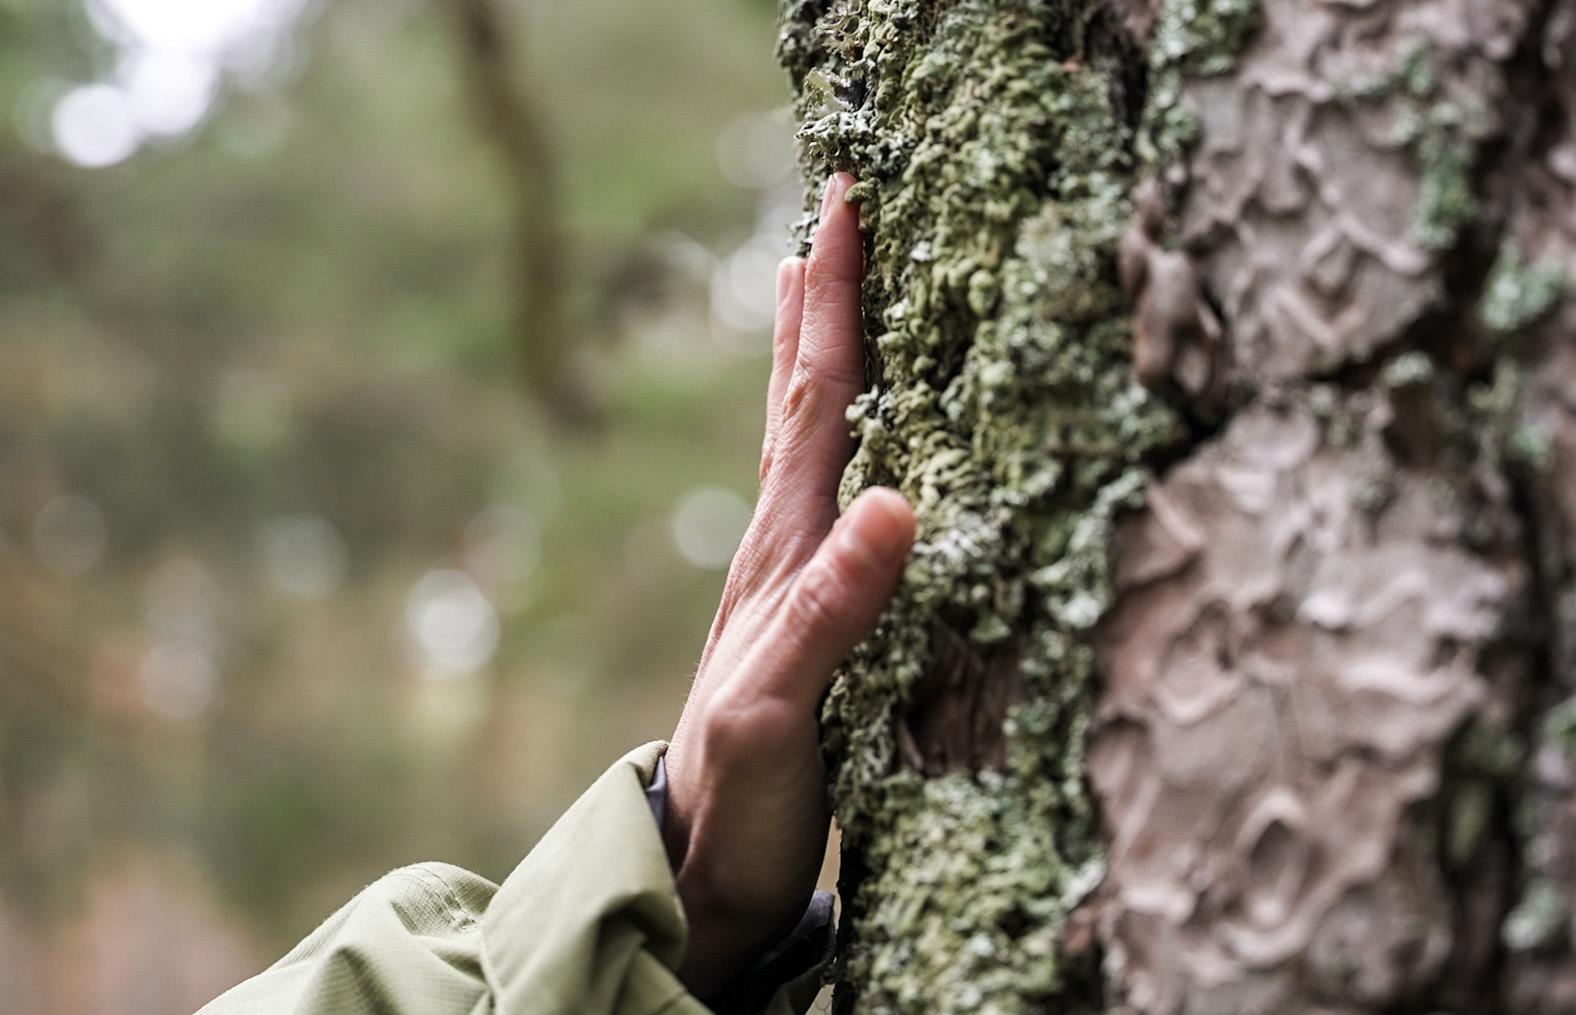 Cabreiroá se une a WWF España para restaurar un paisaje gallego afectado por incendios recurrentes